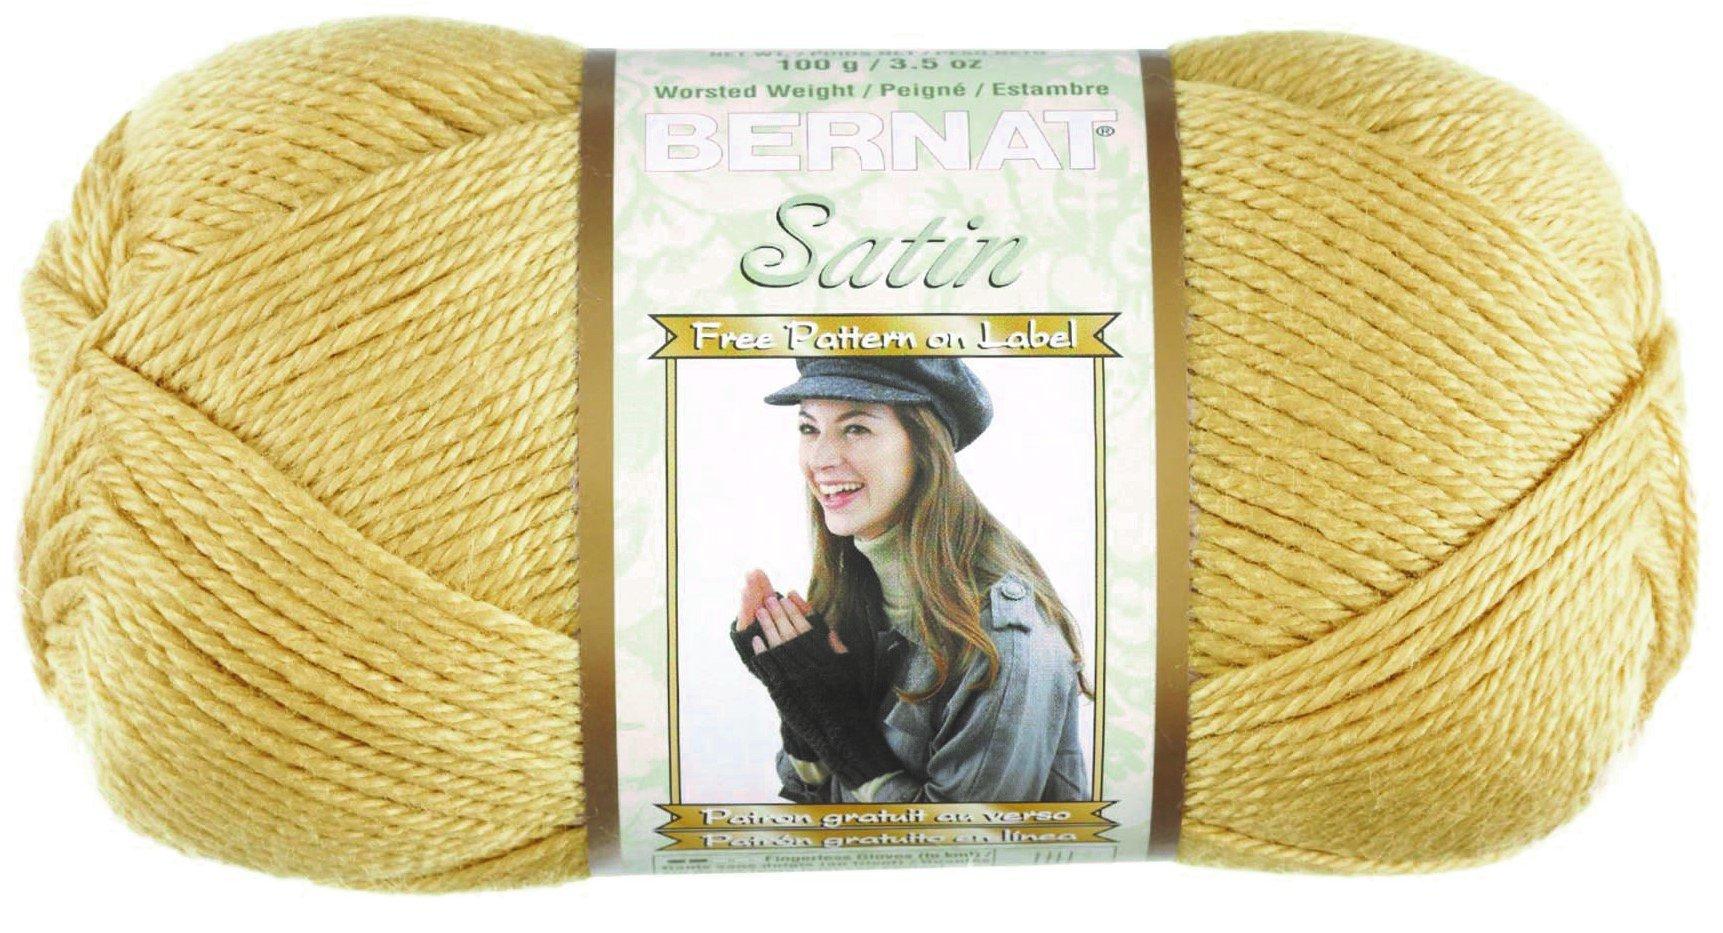 Camel Patterns Crochet | Free Crochet Patterns